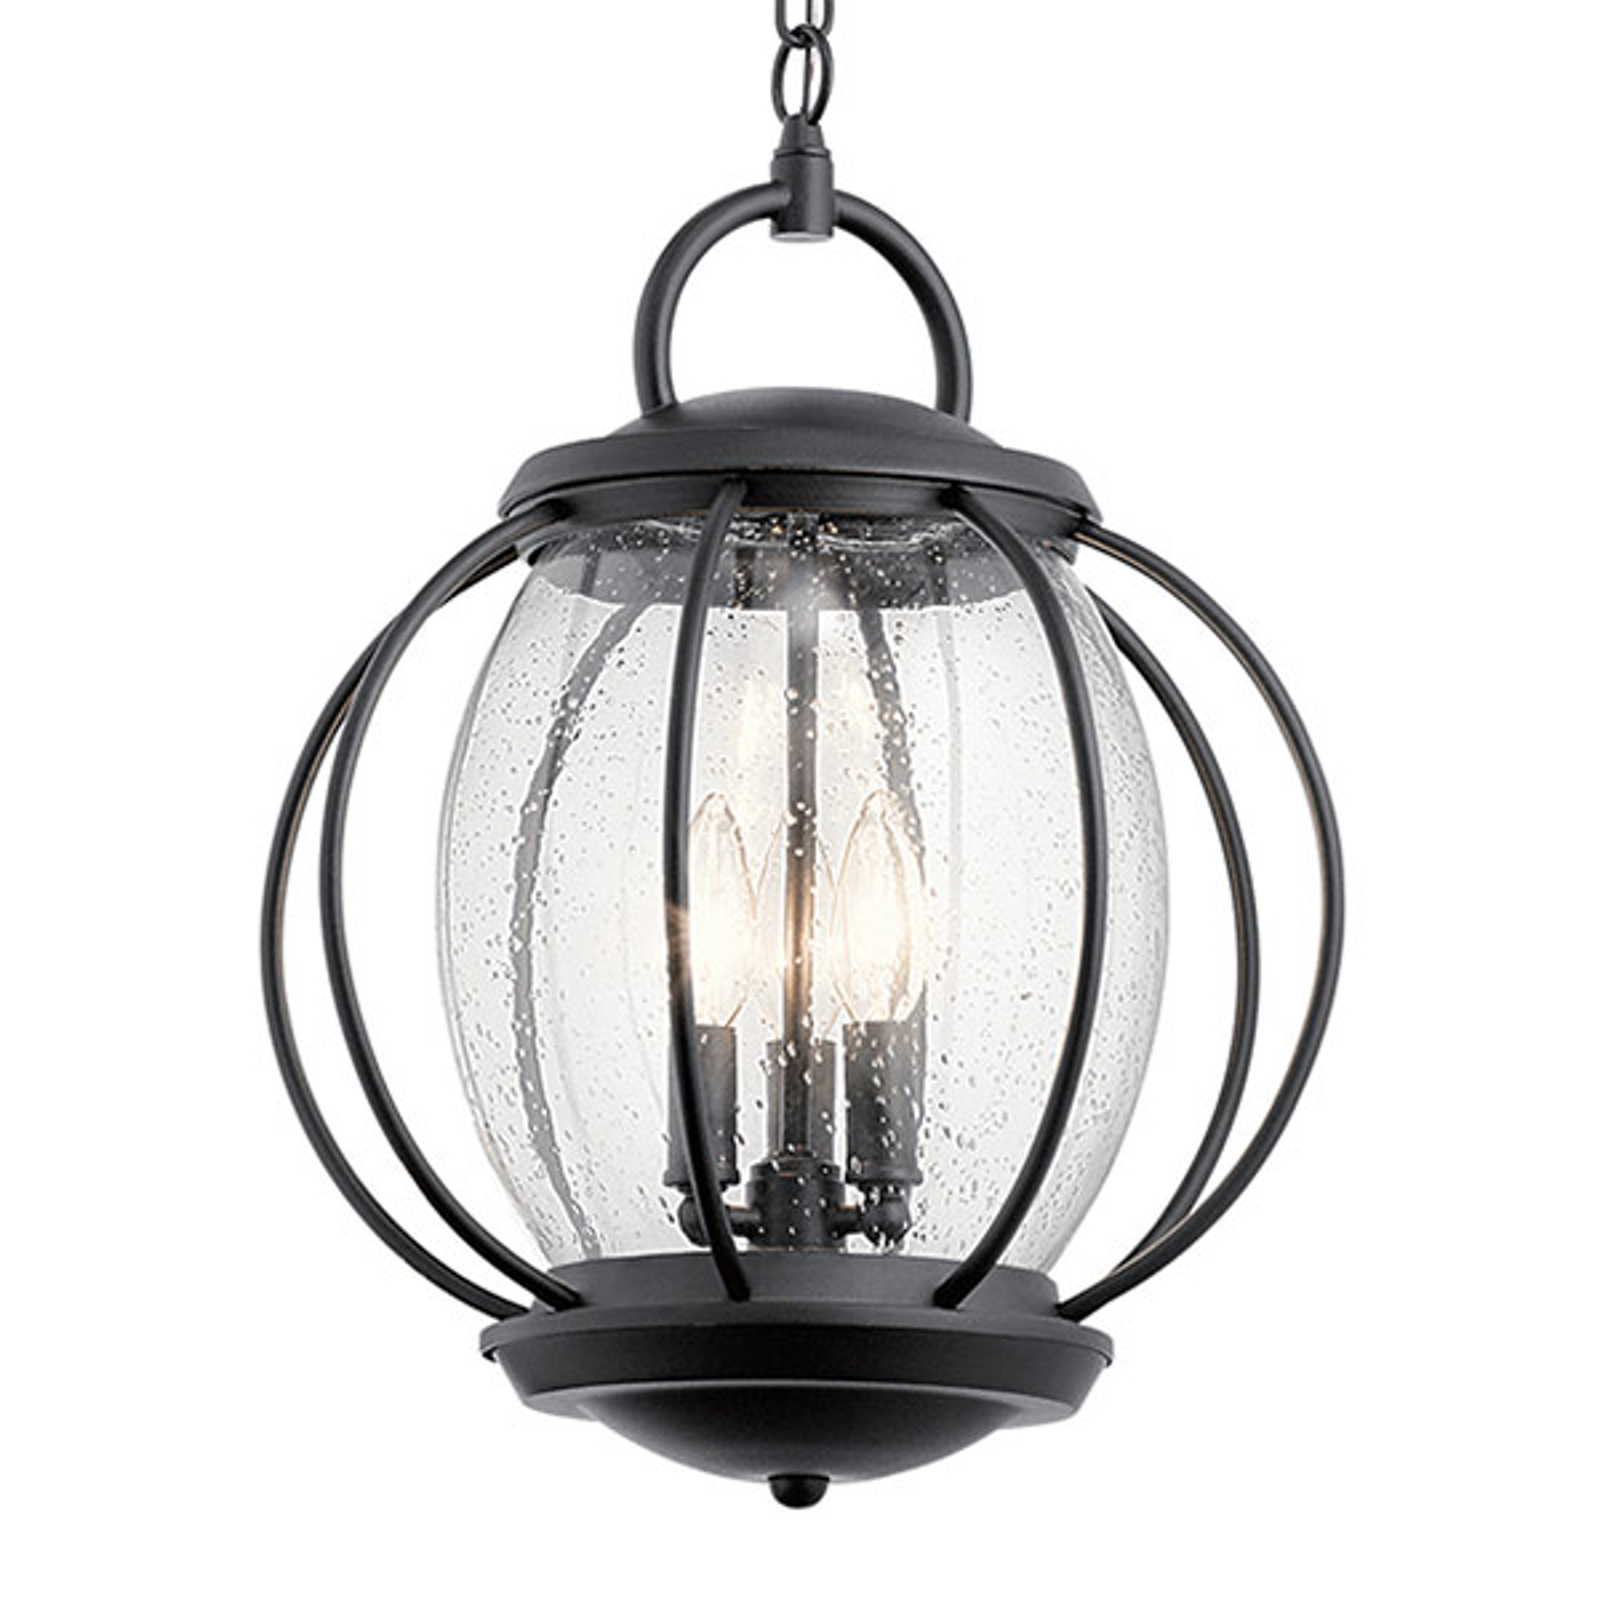 Lampa wisząca Vandalia 3-punktowa